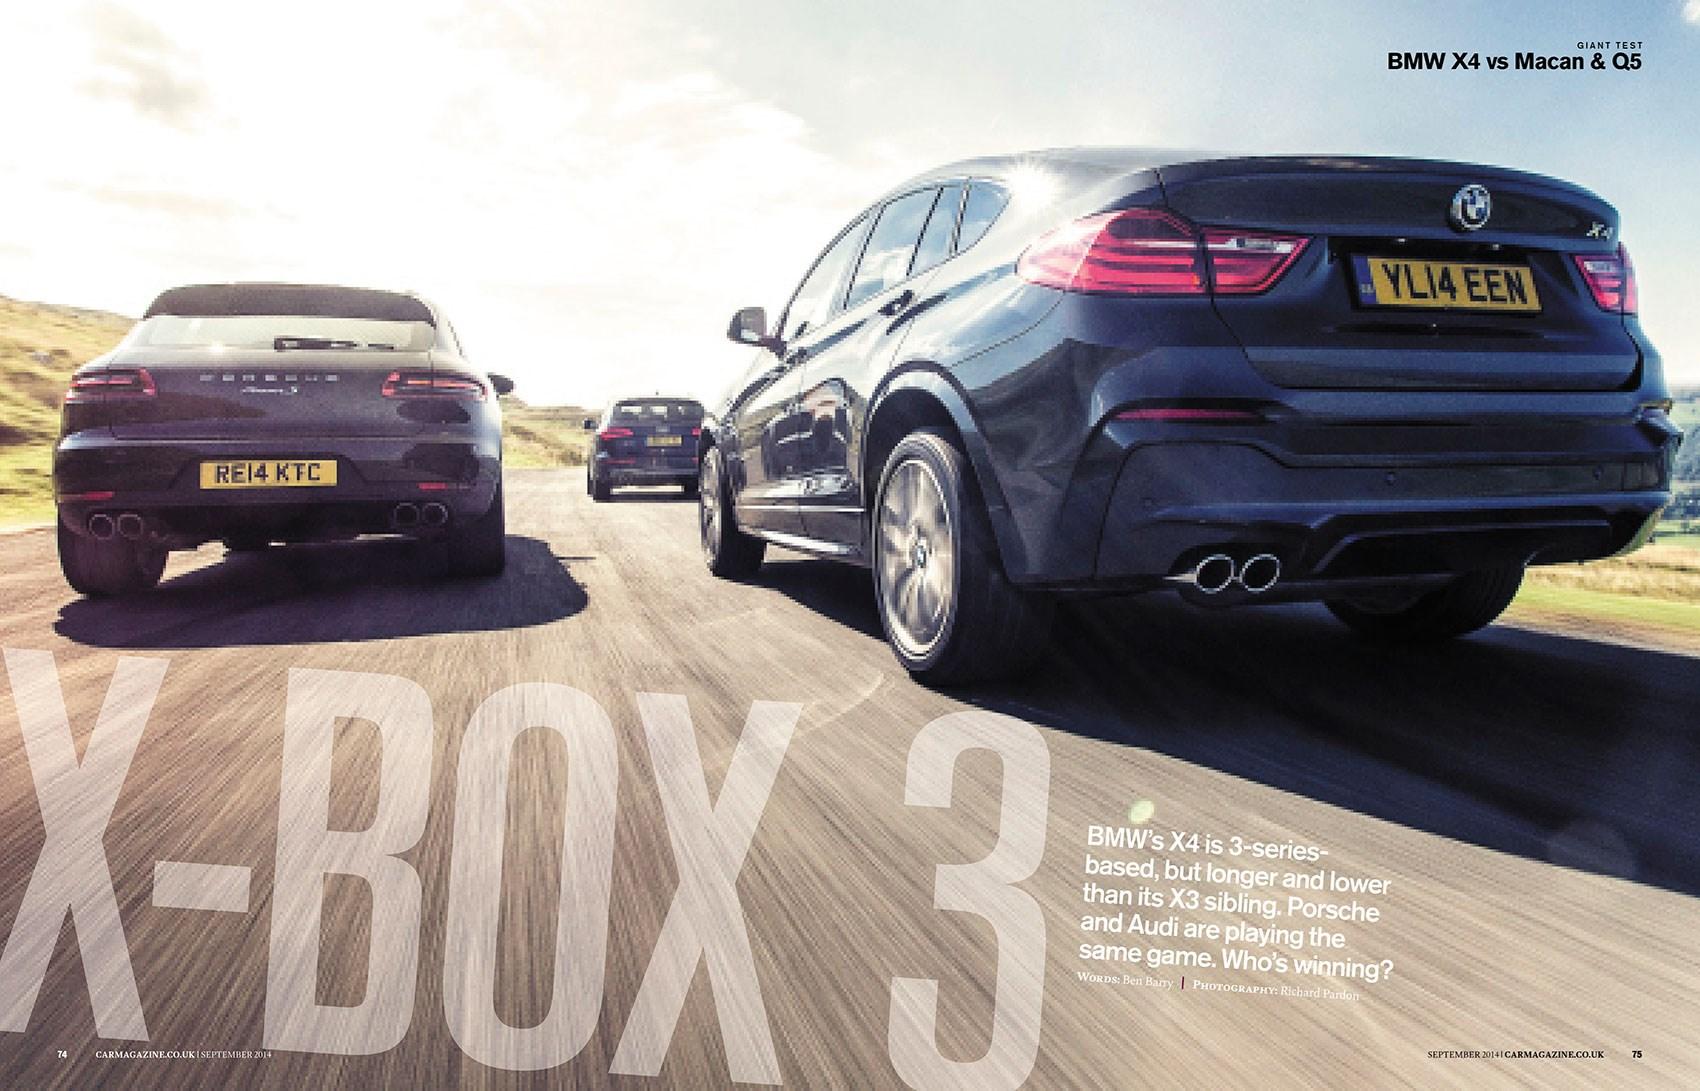 Porsche Macan vs BMW X4 vs Audi Q5 triple test in CAR magazine, September 2014